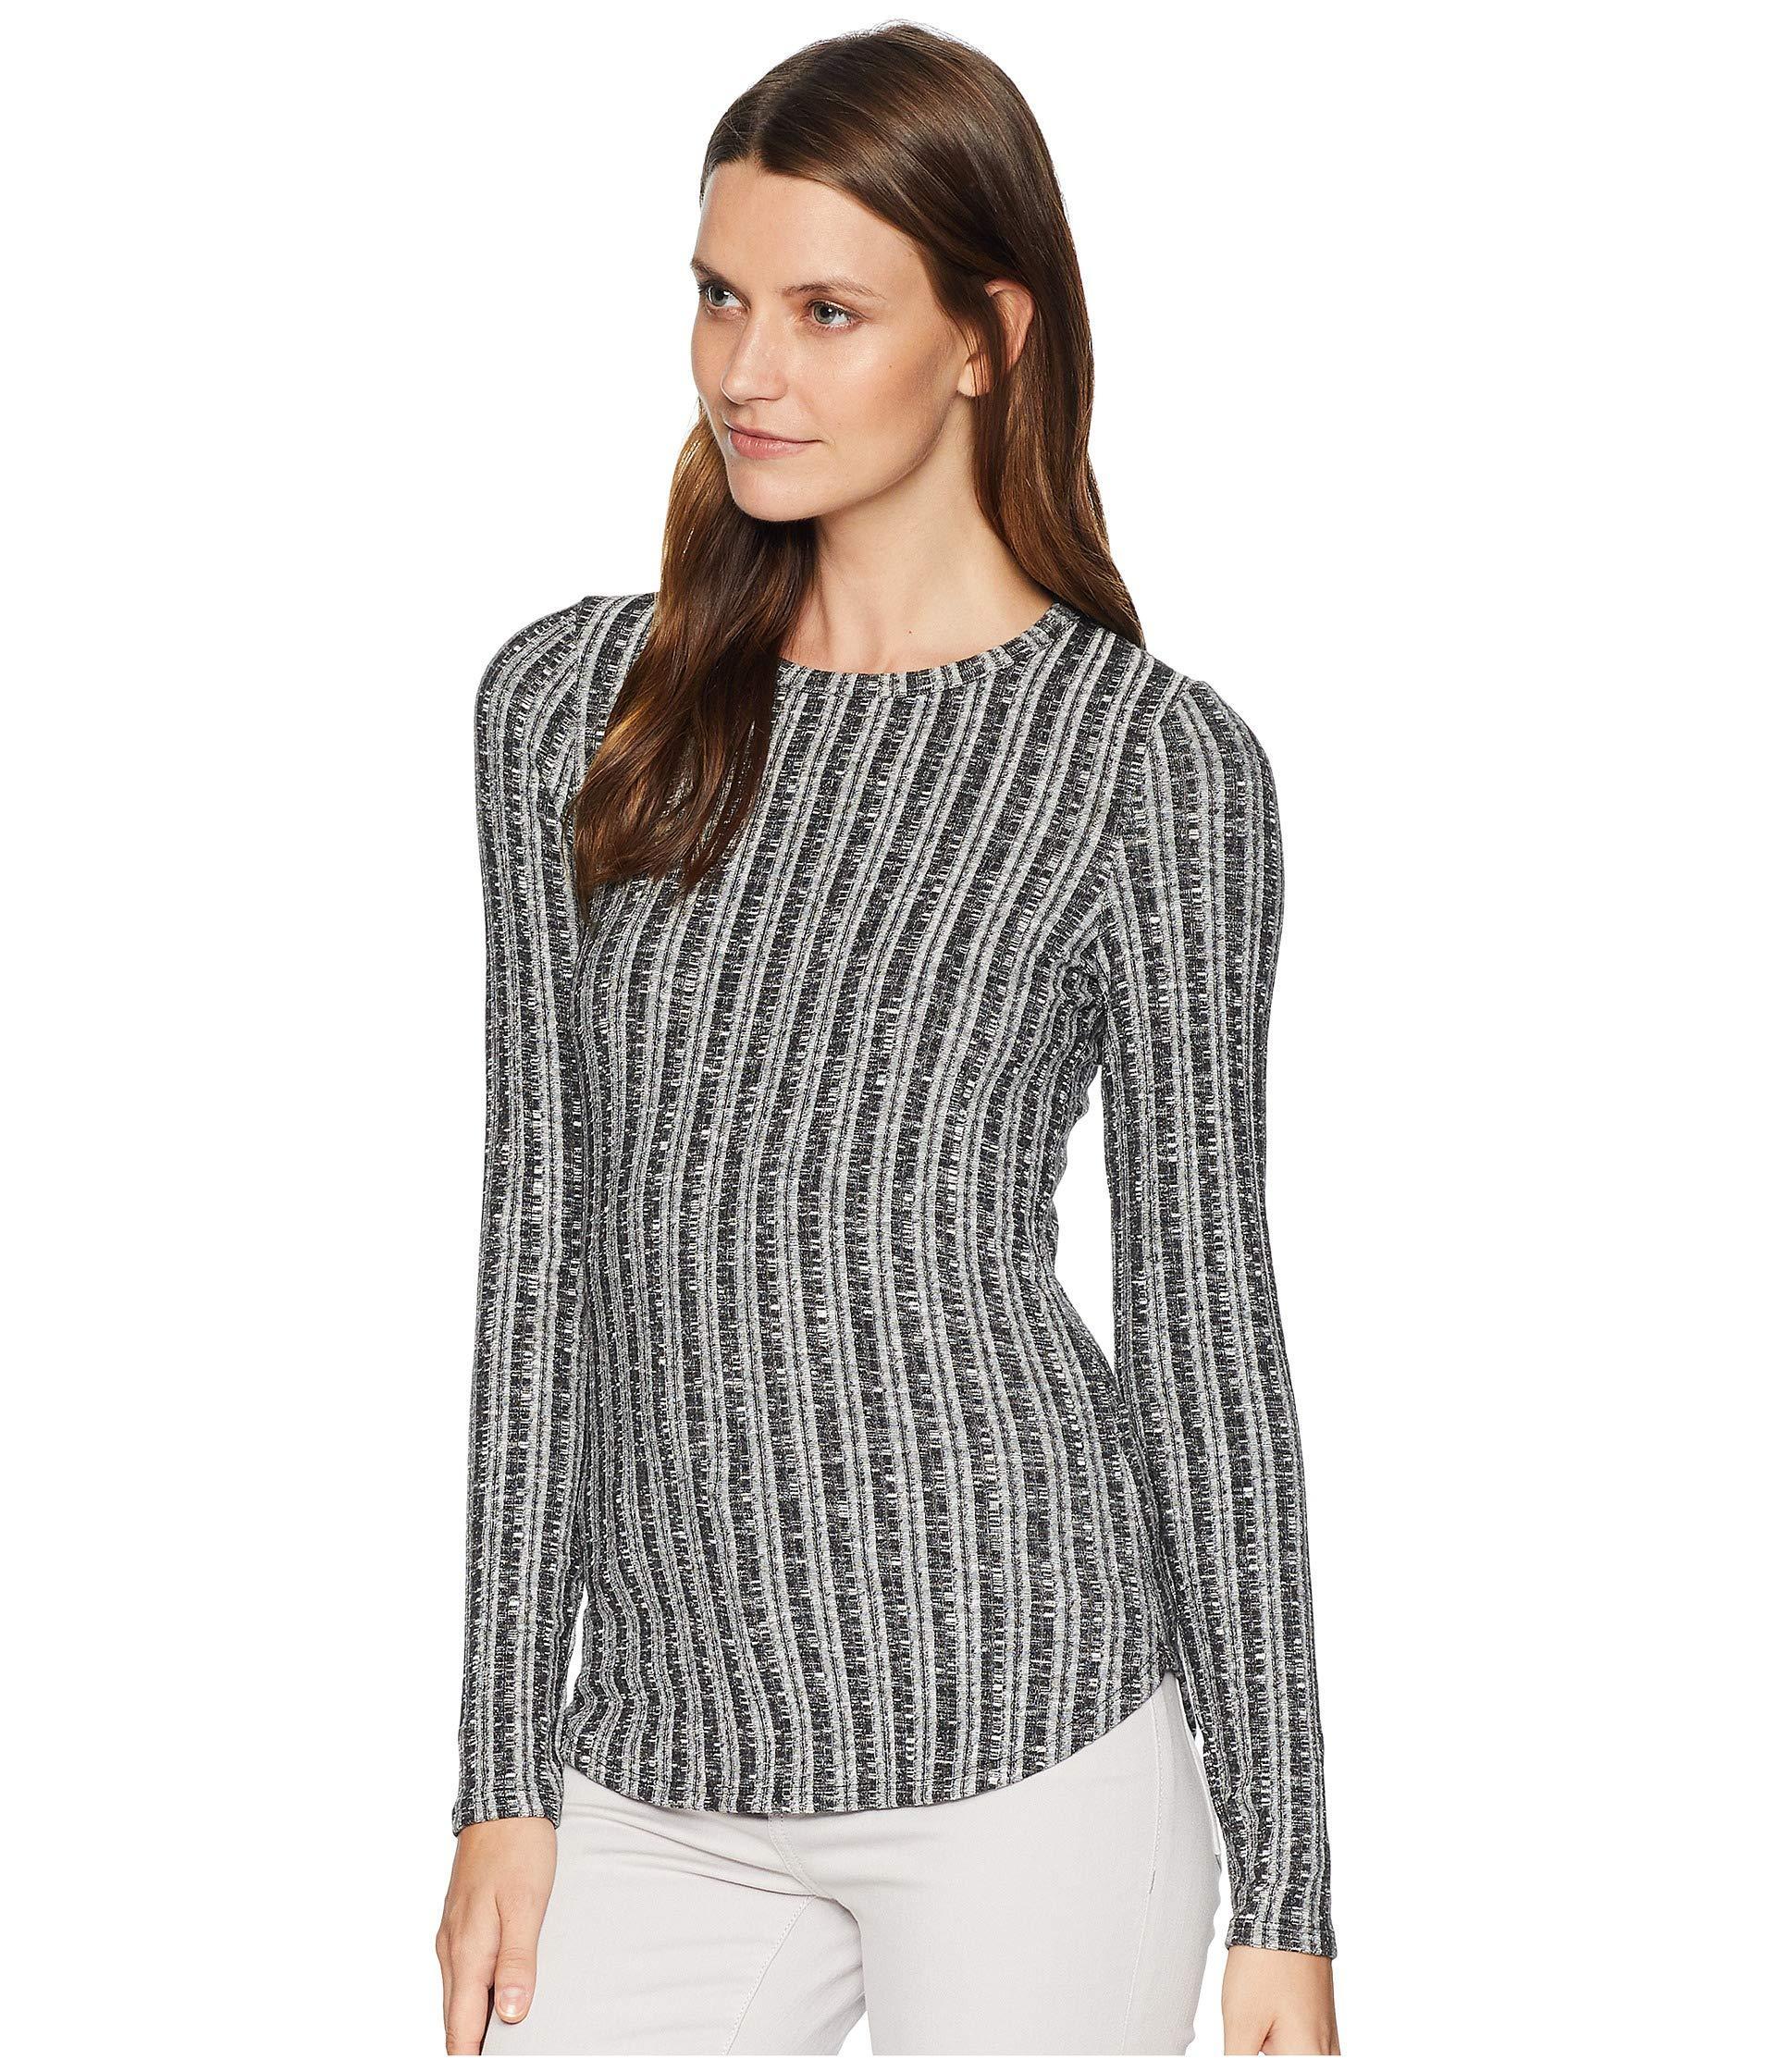 0d4fc58cbef3b Lyst - Three Dots Midtown Sweater Top in Black - Save 3%